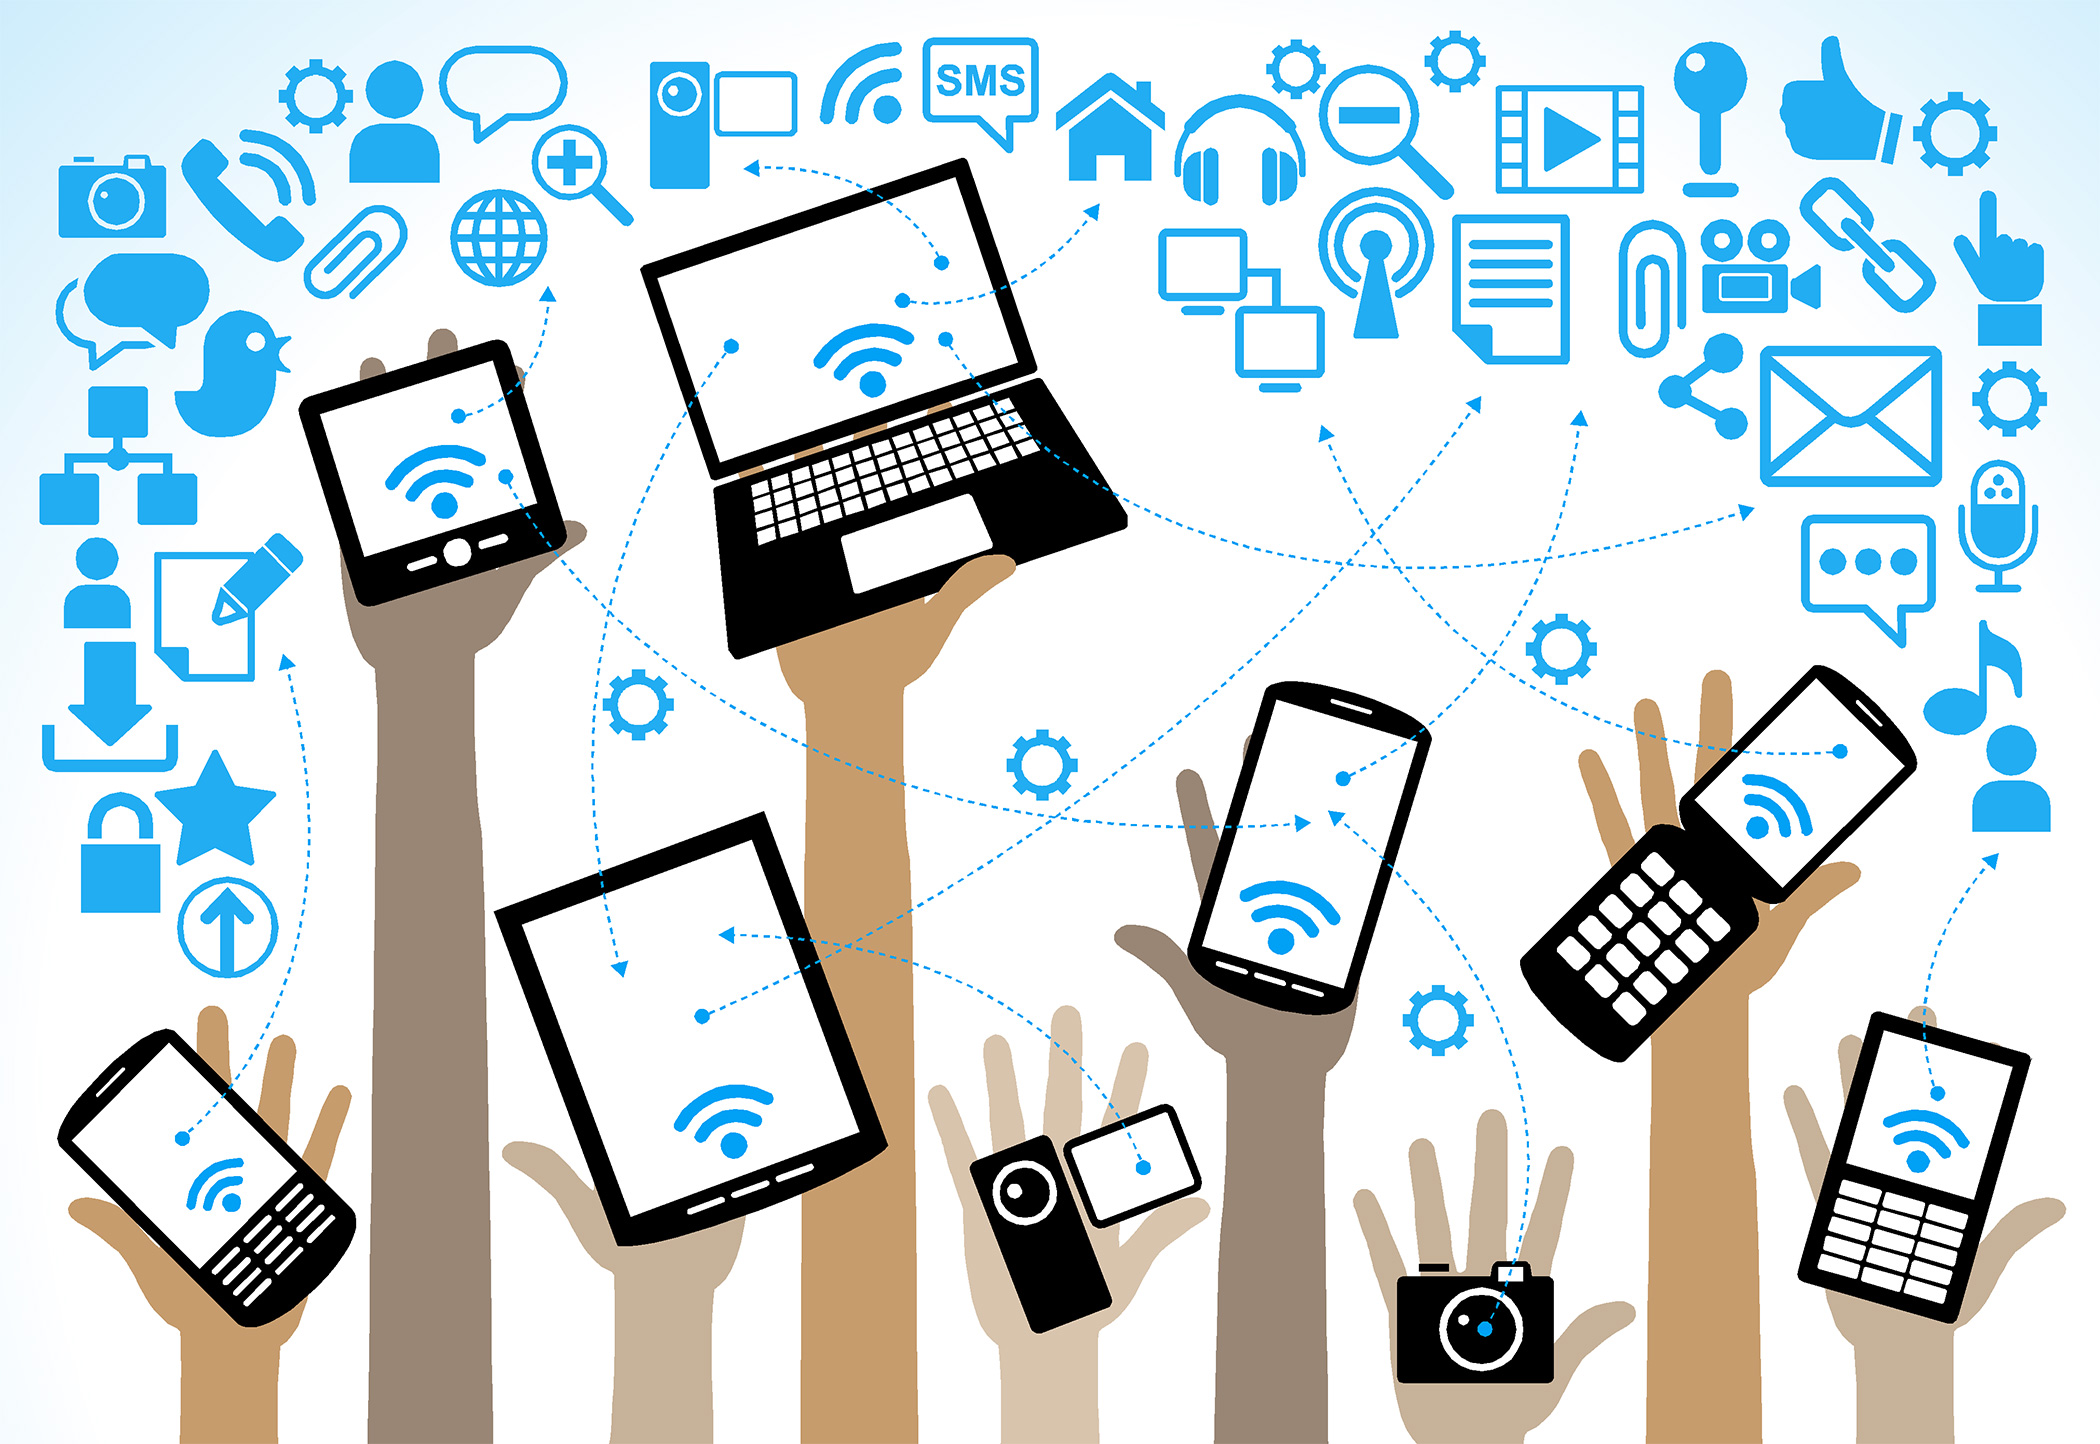 smart devices 09 | облсуговування пристроїв 09 | netgroup